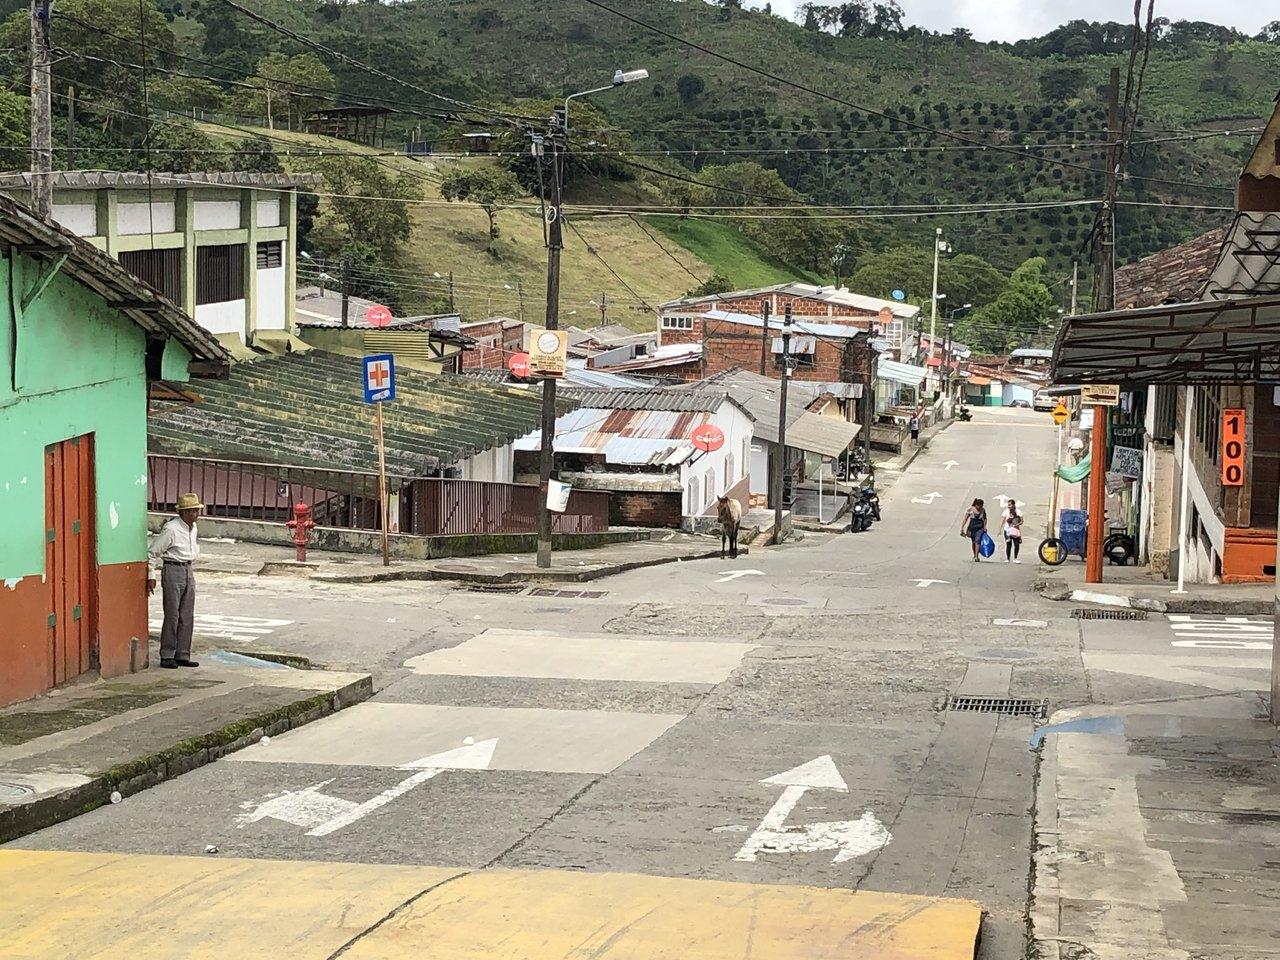 Cordoba, Quindio | Photo taken by Rachel B